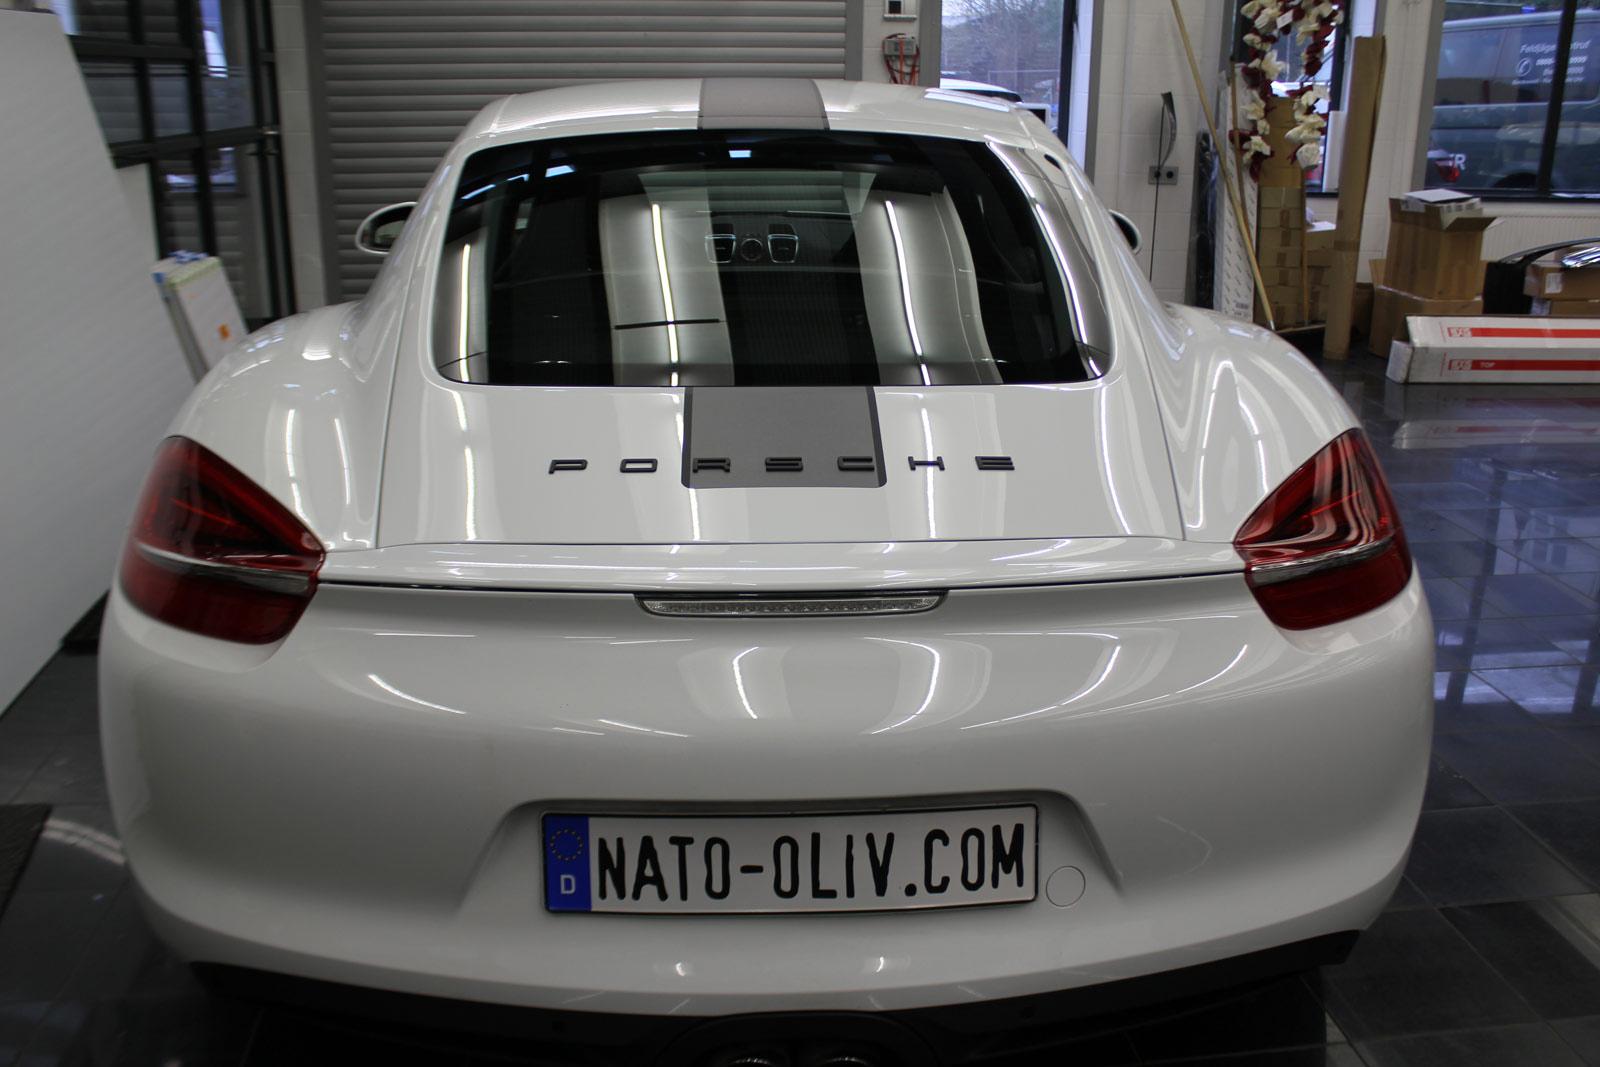 Porsche_Cayman_2014_weiss_Rallyestreifen_gunmetal_metallic_matt_mit_schwarz_matt_03